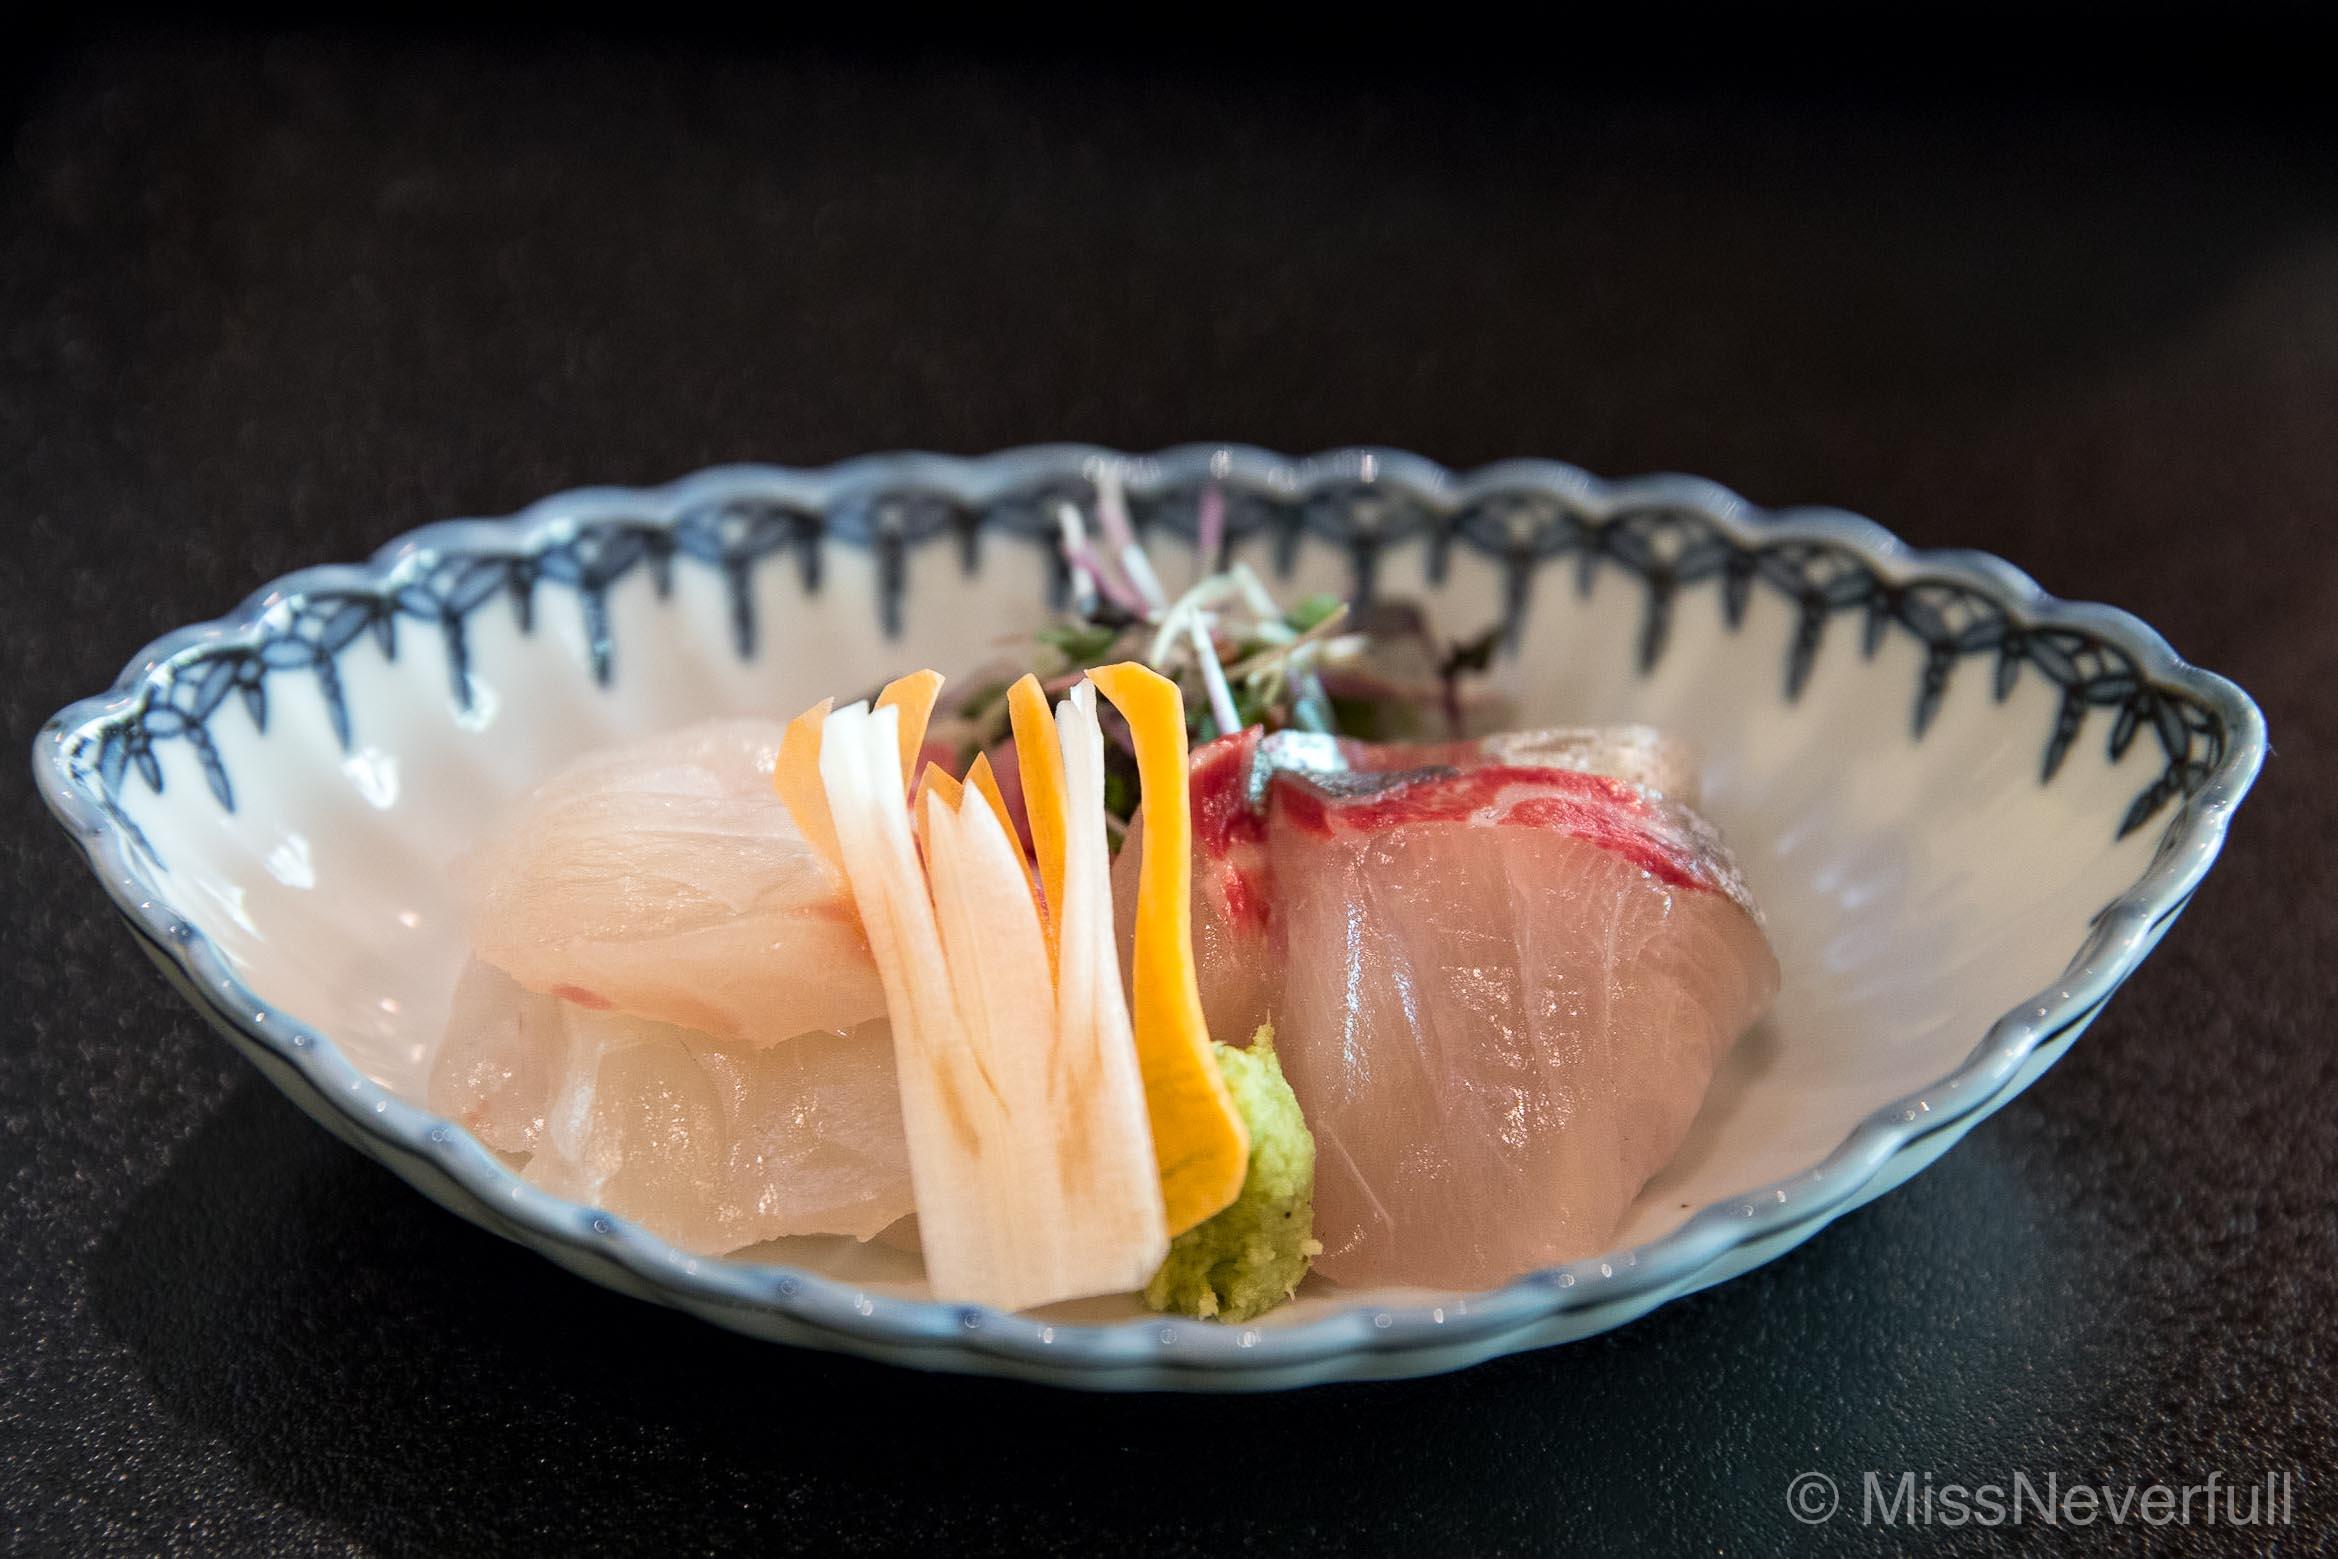 Appetizer 2: Sashimi